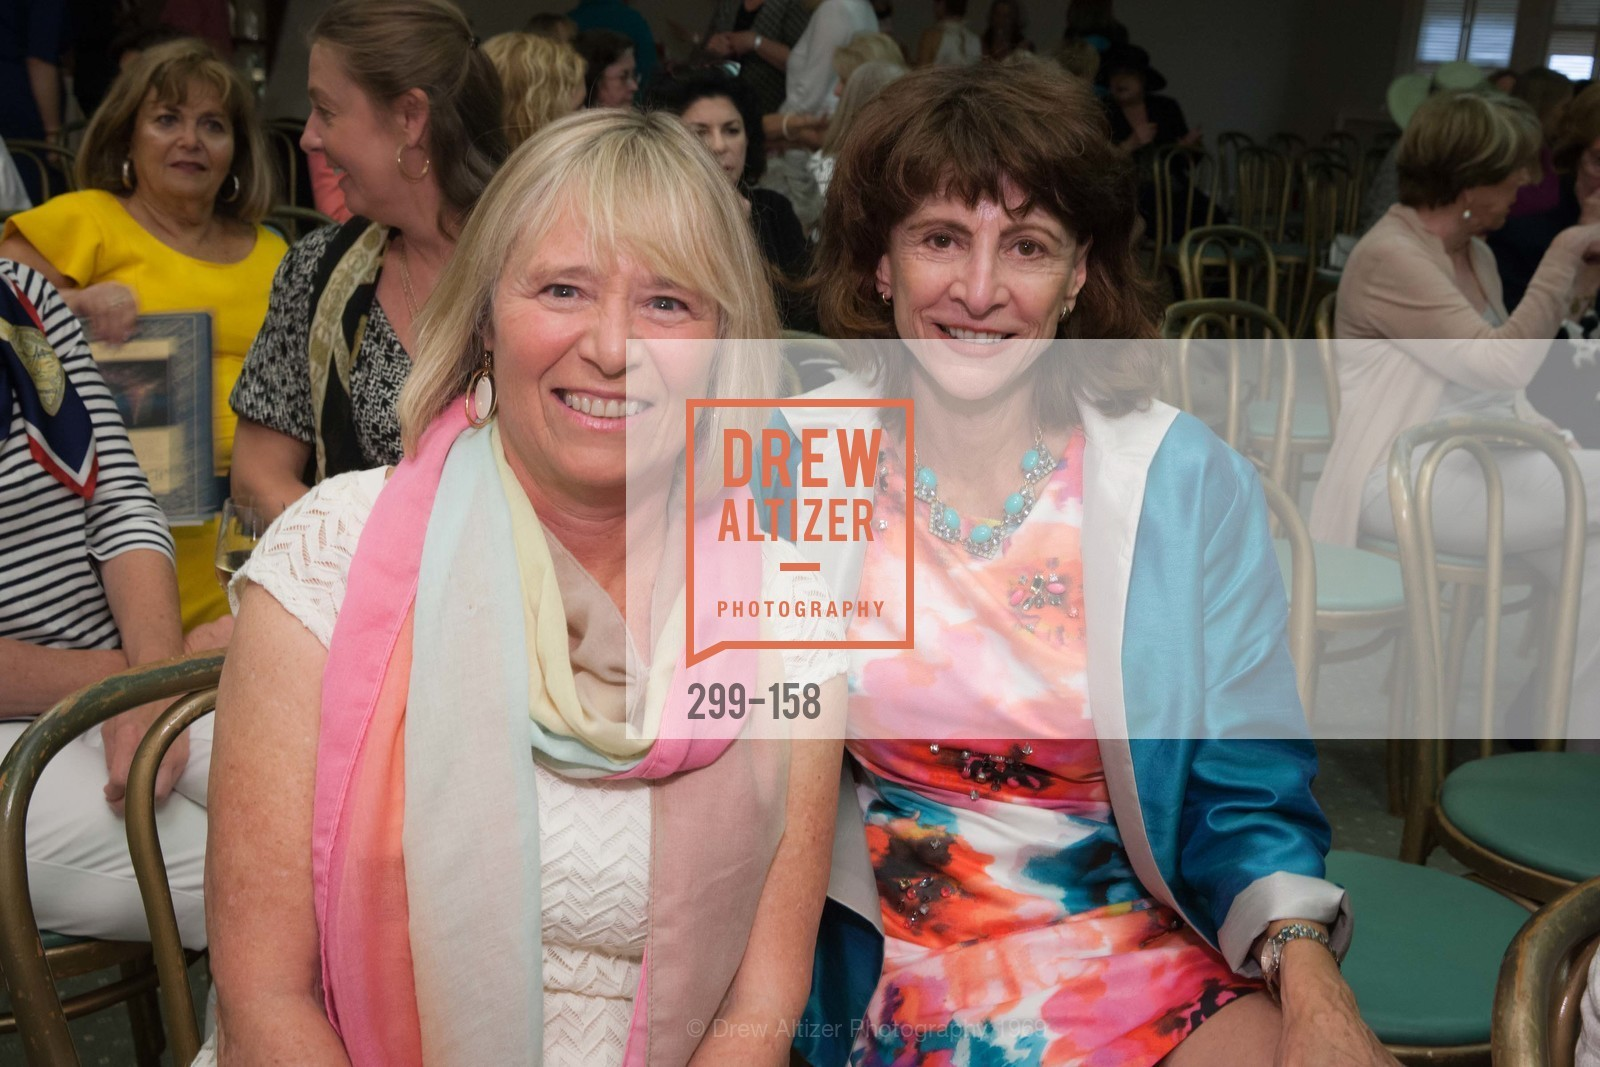 Top pics, Metropolitan Club Hosts Centennial Tea, June 8th, 2015, Photo,Drew Altizer, Drew Altizer Photography, full-service agency, private events, San Francisco photographer, photographer california